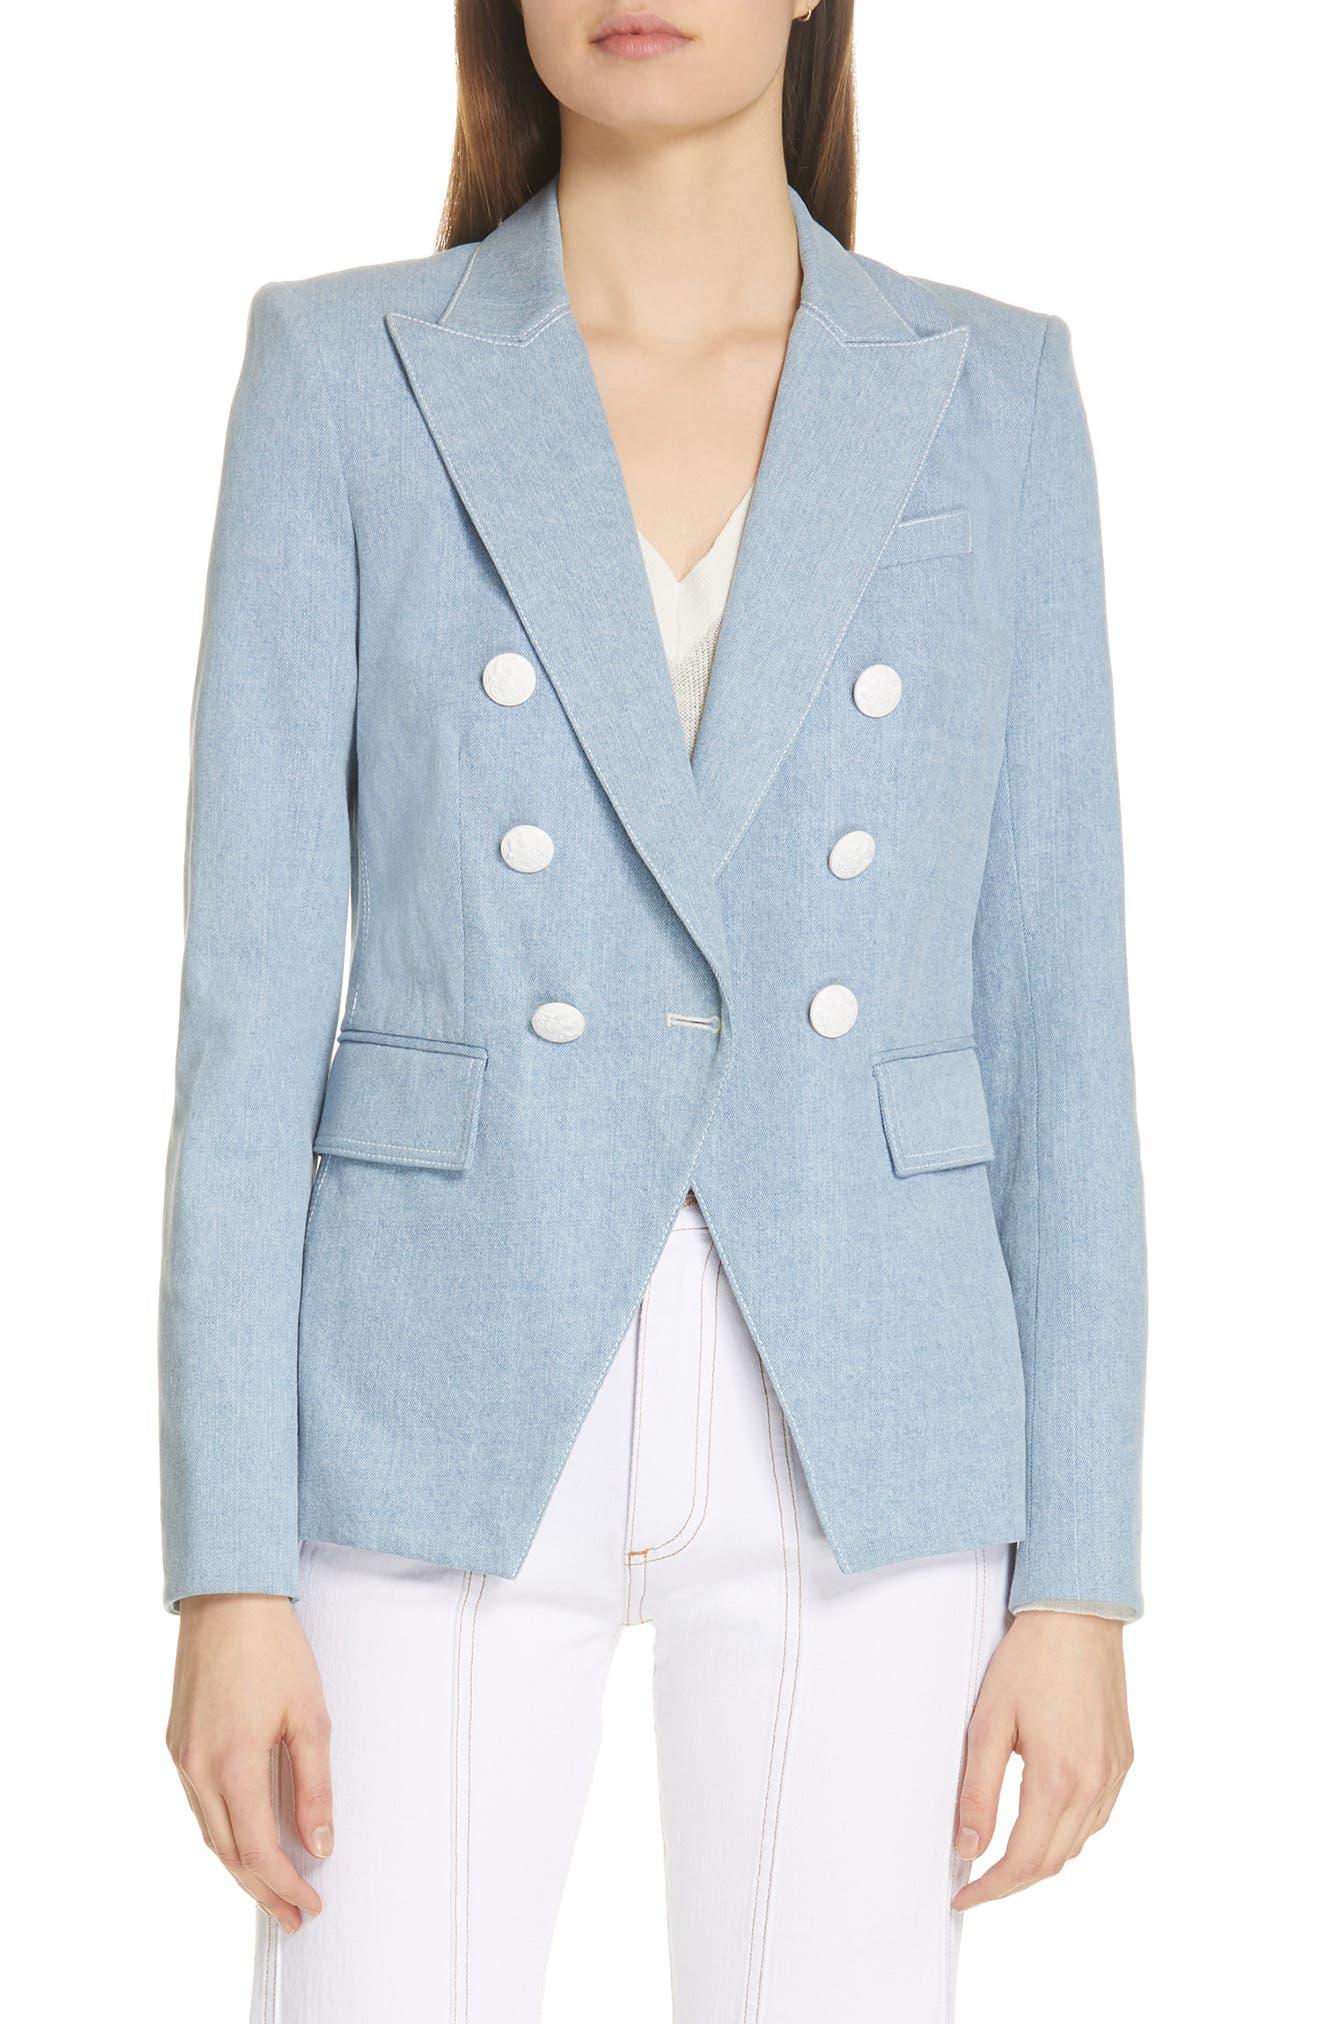 VERONICA BEARD Miller Denim Dickey Jacket, Main, color, DENIM